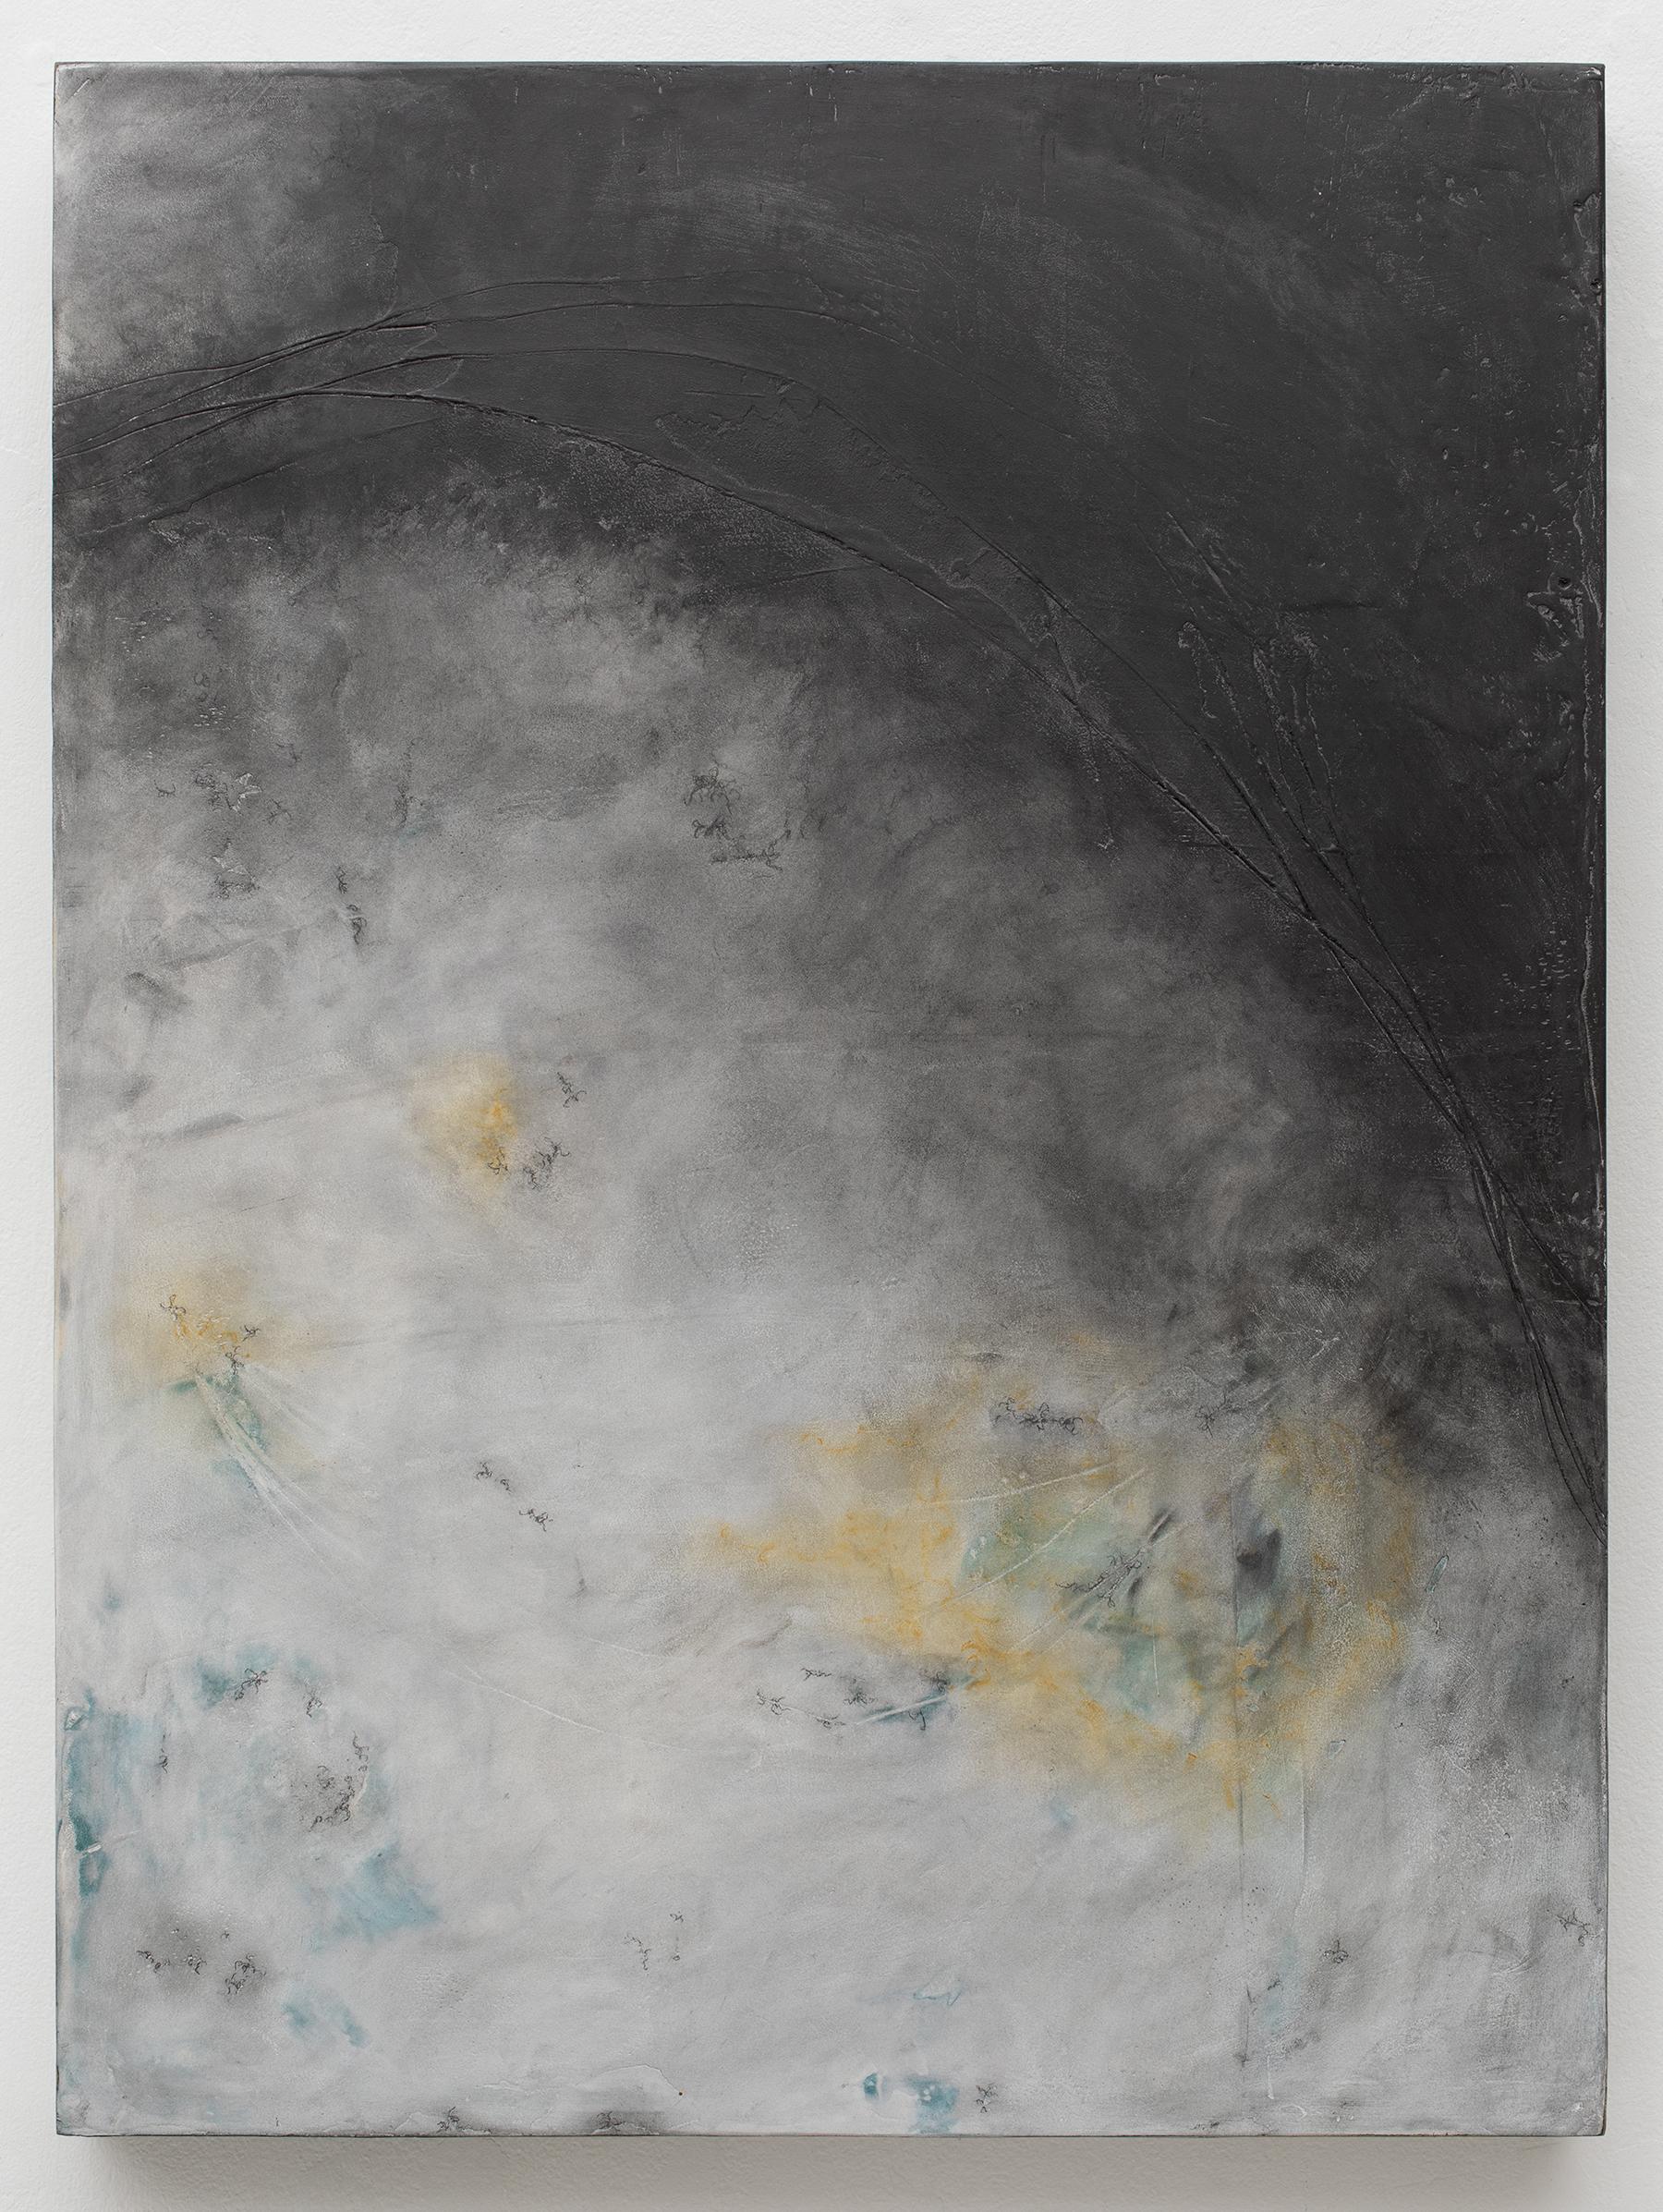 Deepening Mystery , 2018, plaster, graphite, acrylic on birch panel; photo by Dan Kvitka